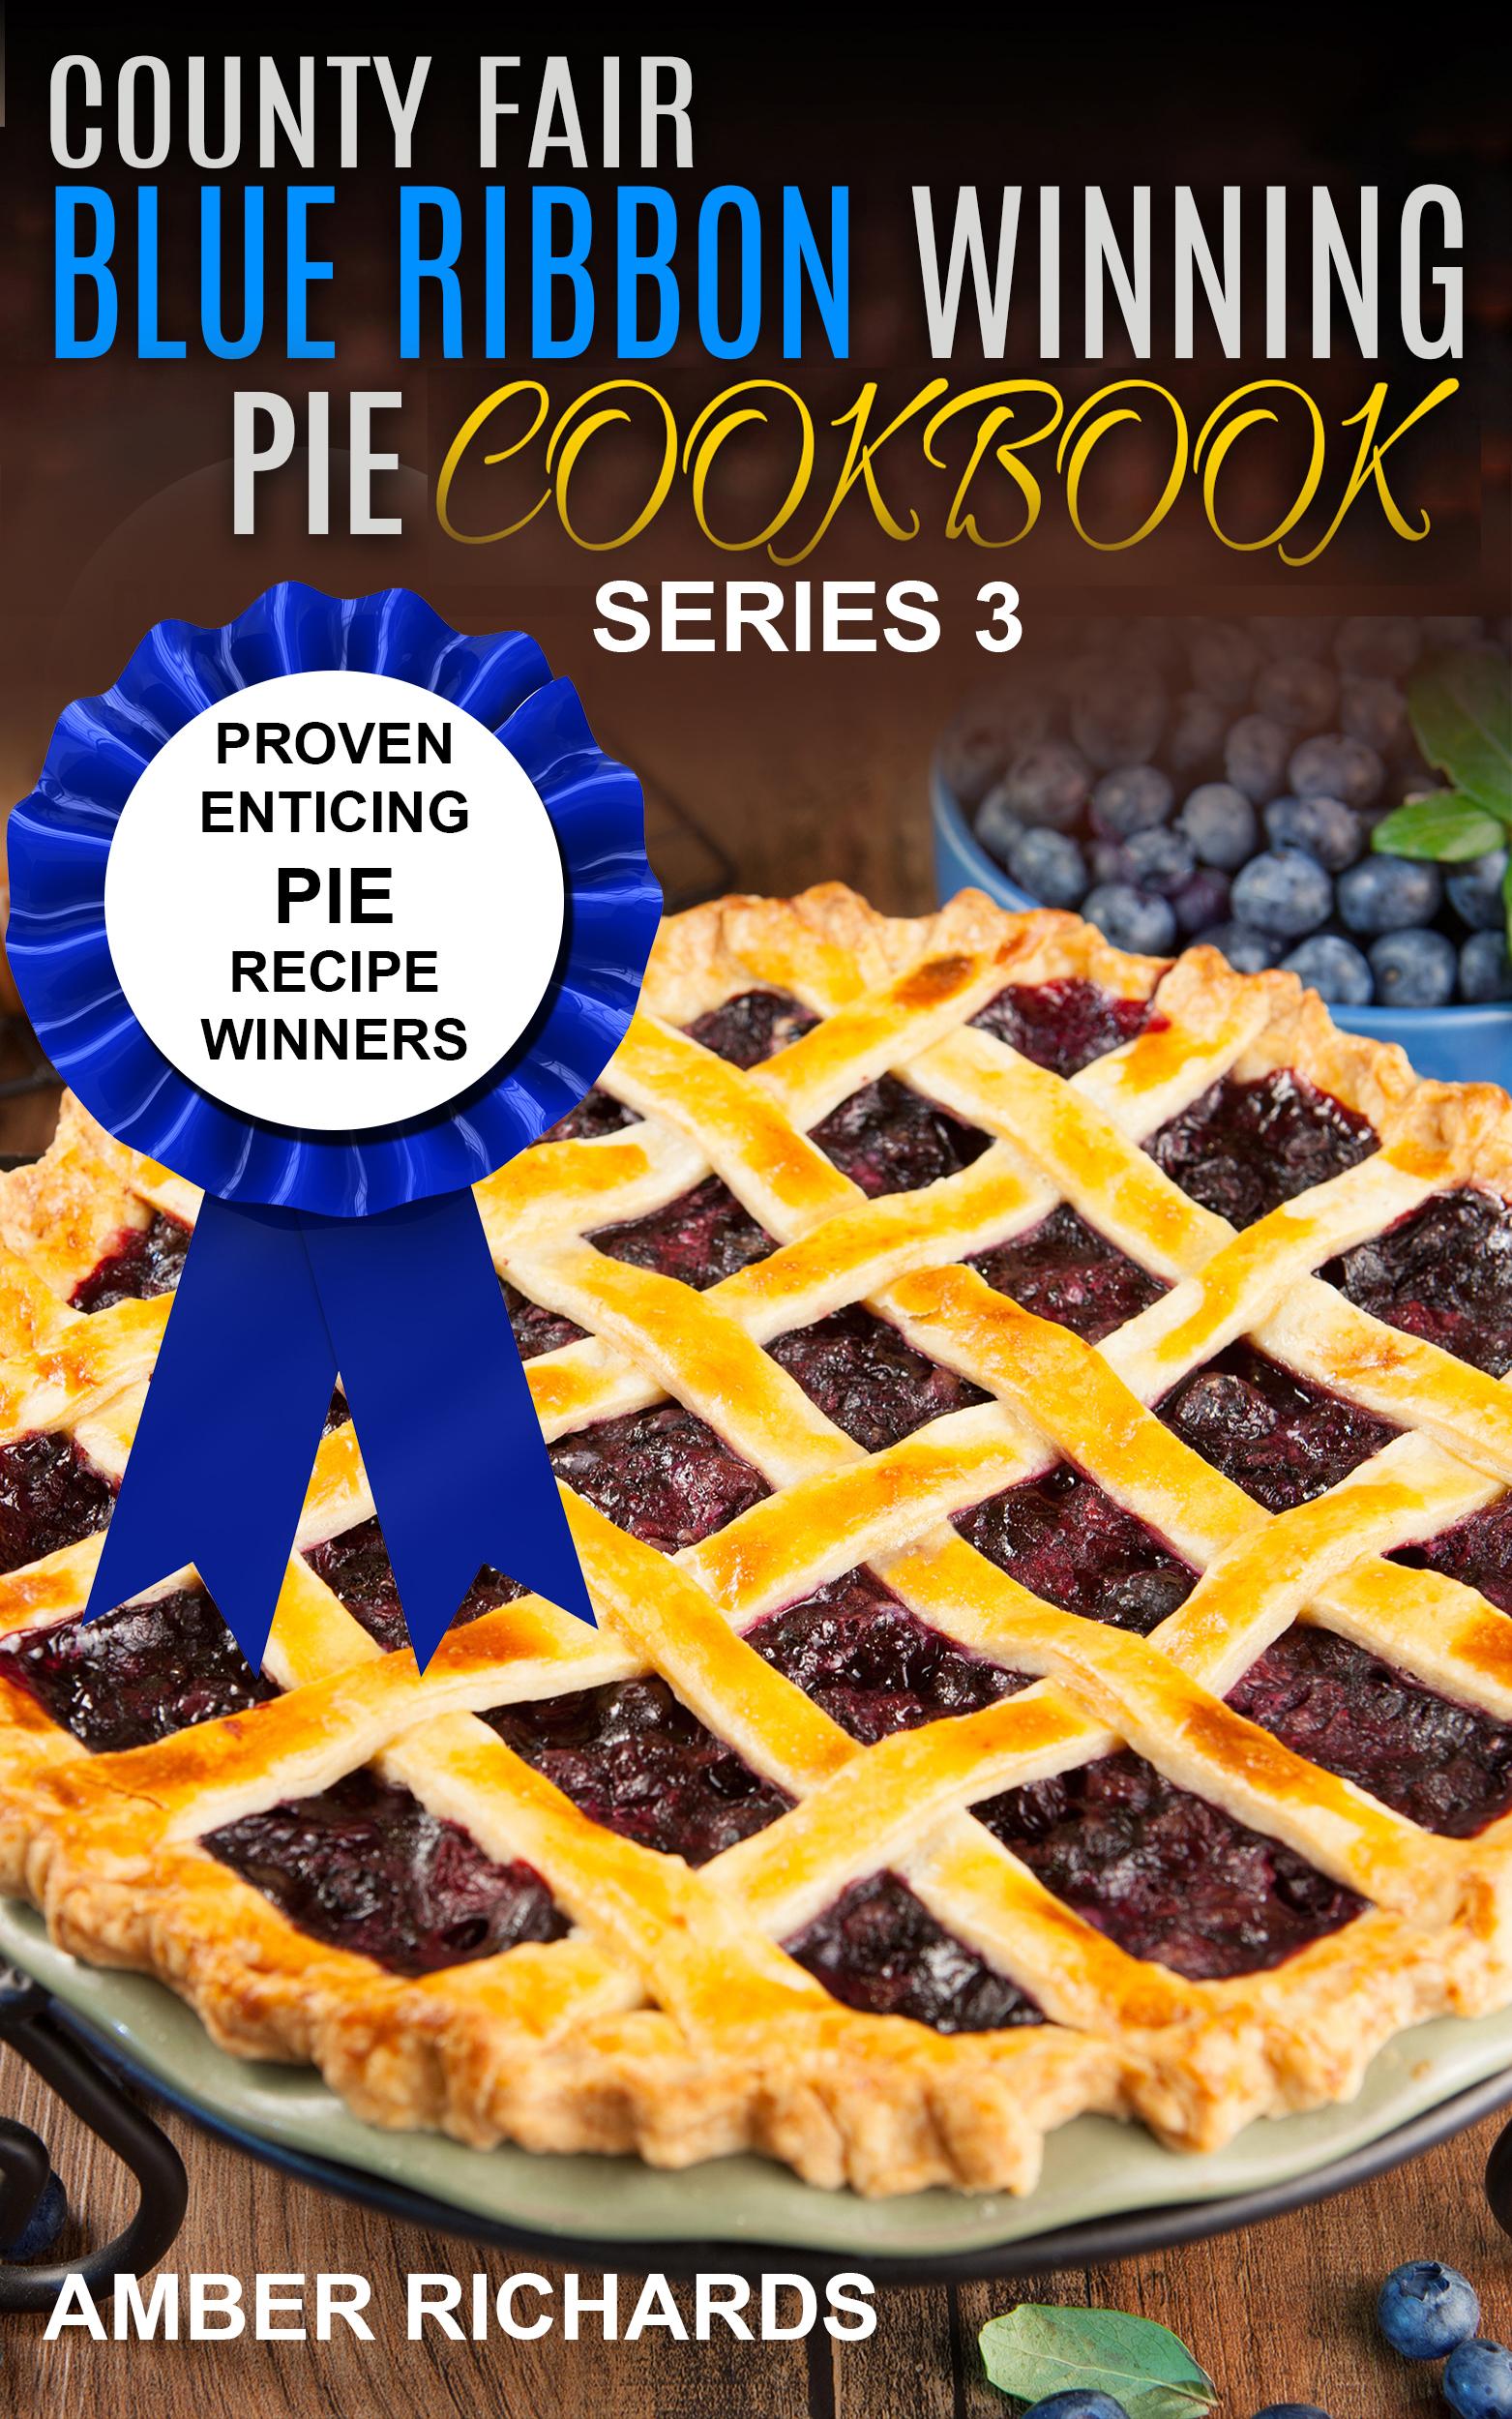 County fair blue ribbon winning pie cookbook: proven enticing pie recipe winners